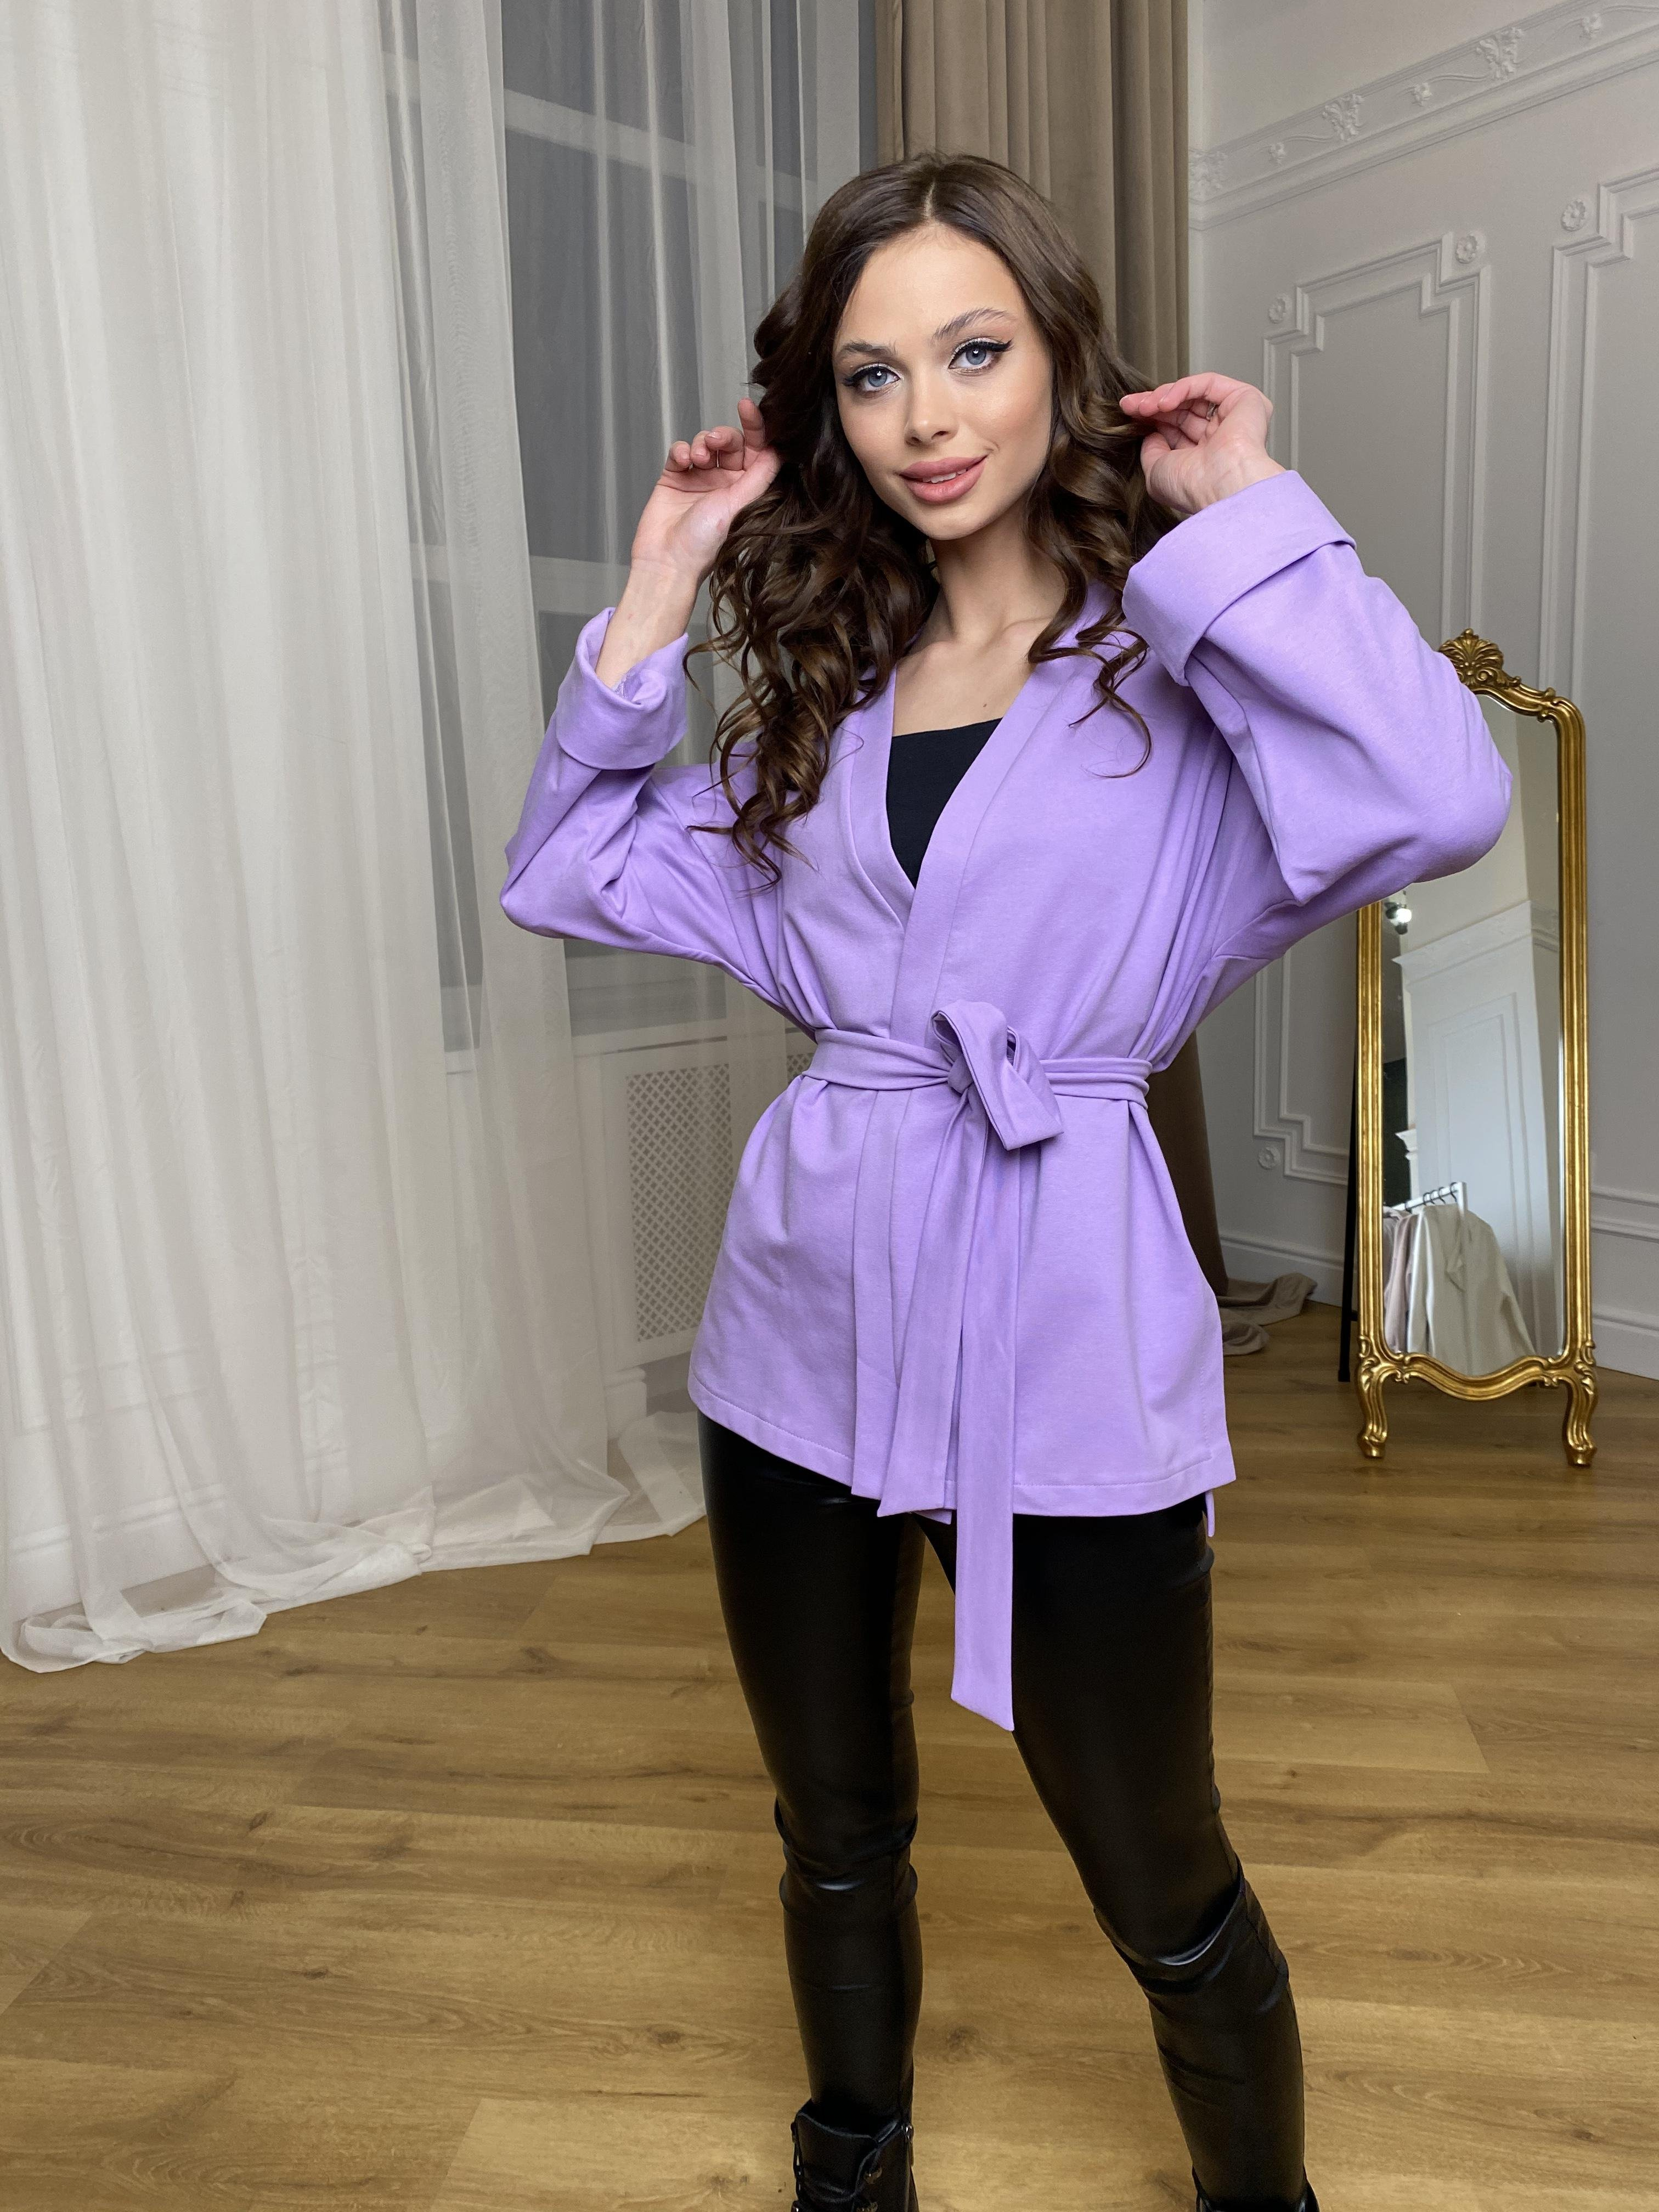 Жакет Лаванда 9665 АРТ. 45975 Цвет: лаванда - фото 7, интернет магазин tm-modus.ru